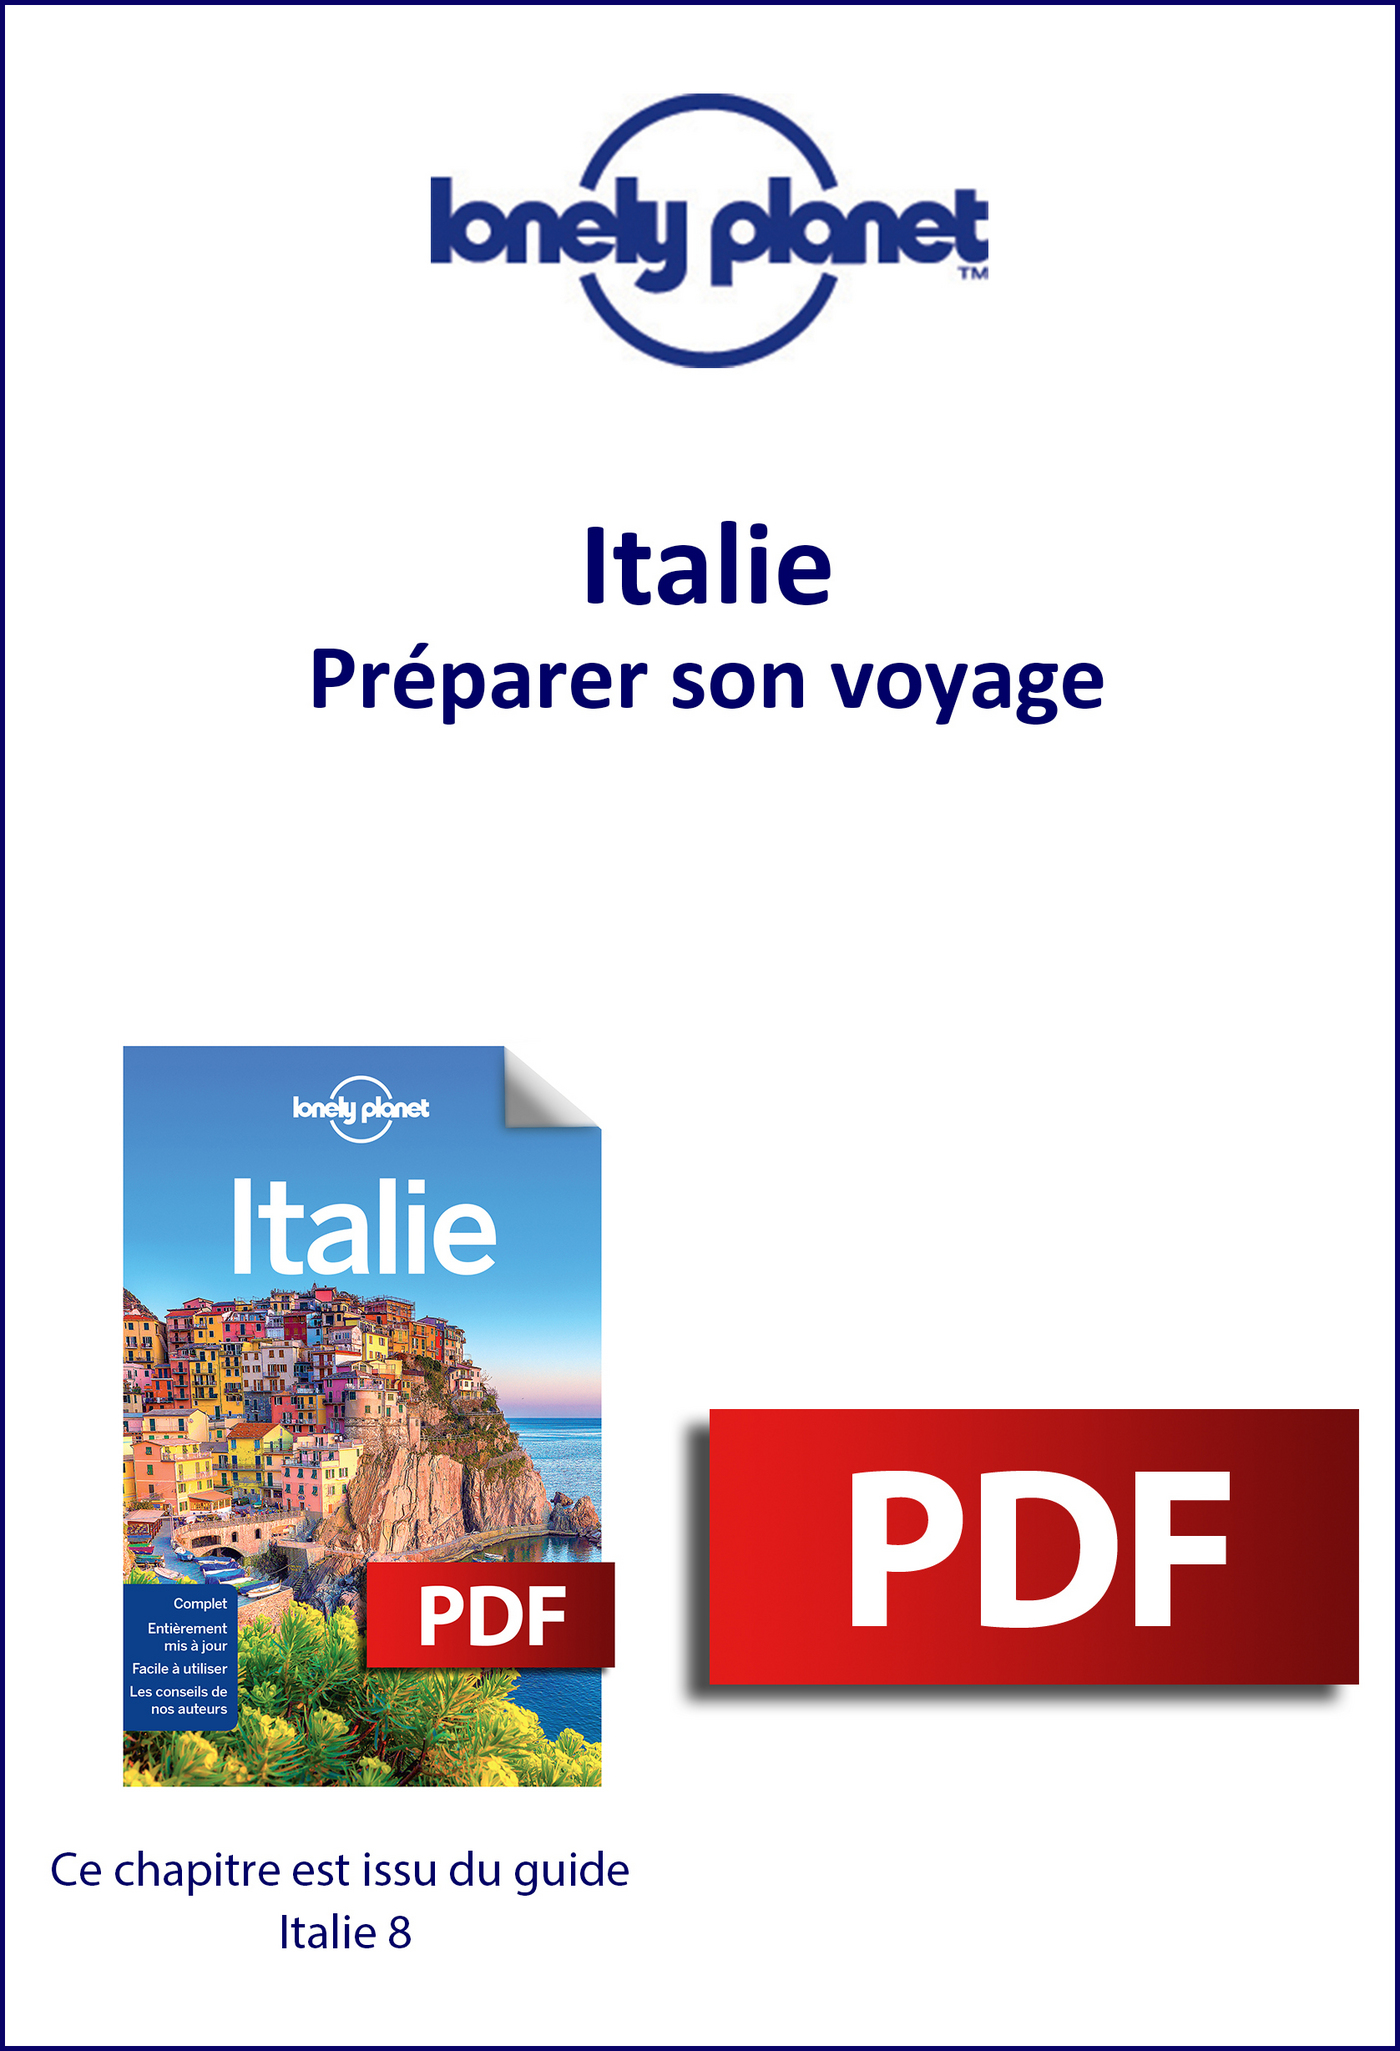 Italie - Préparer son voyage